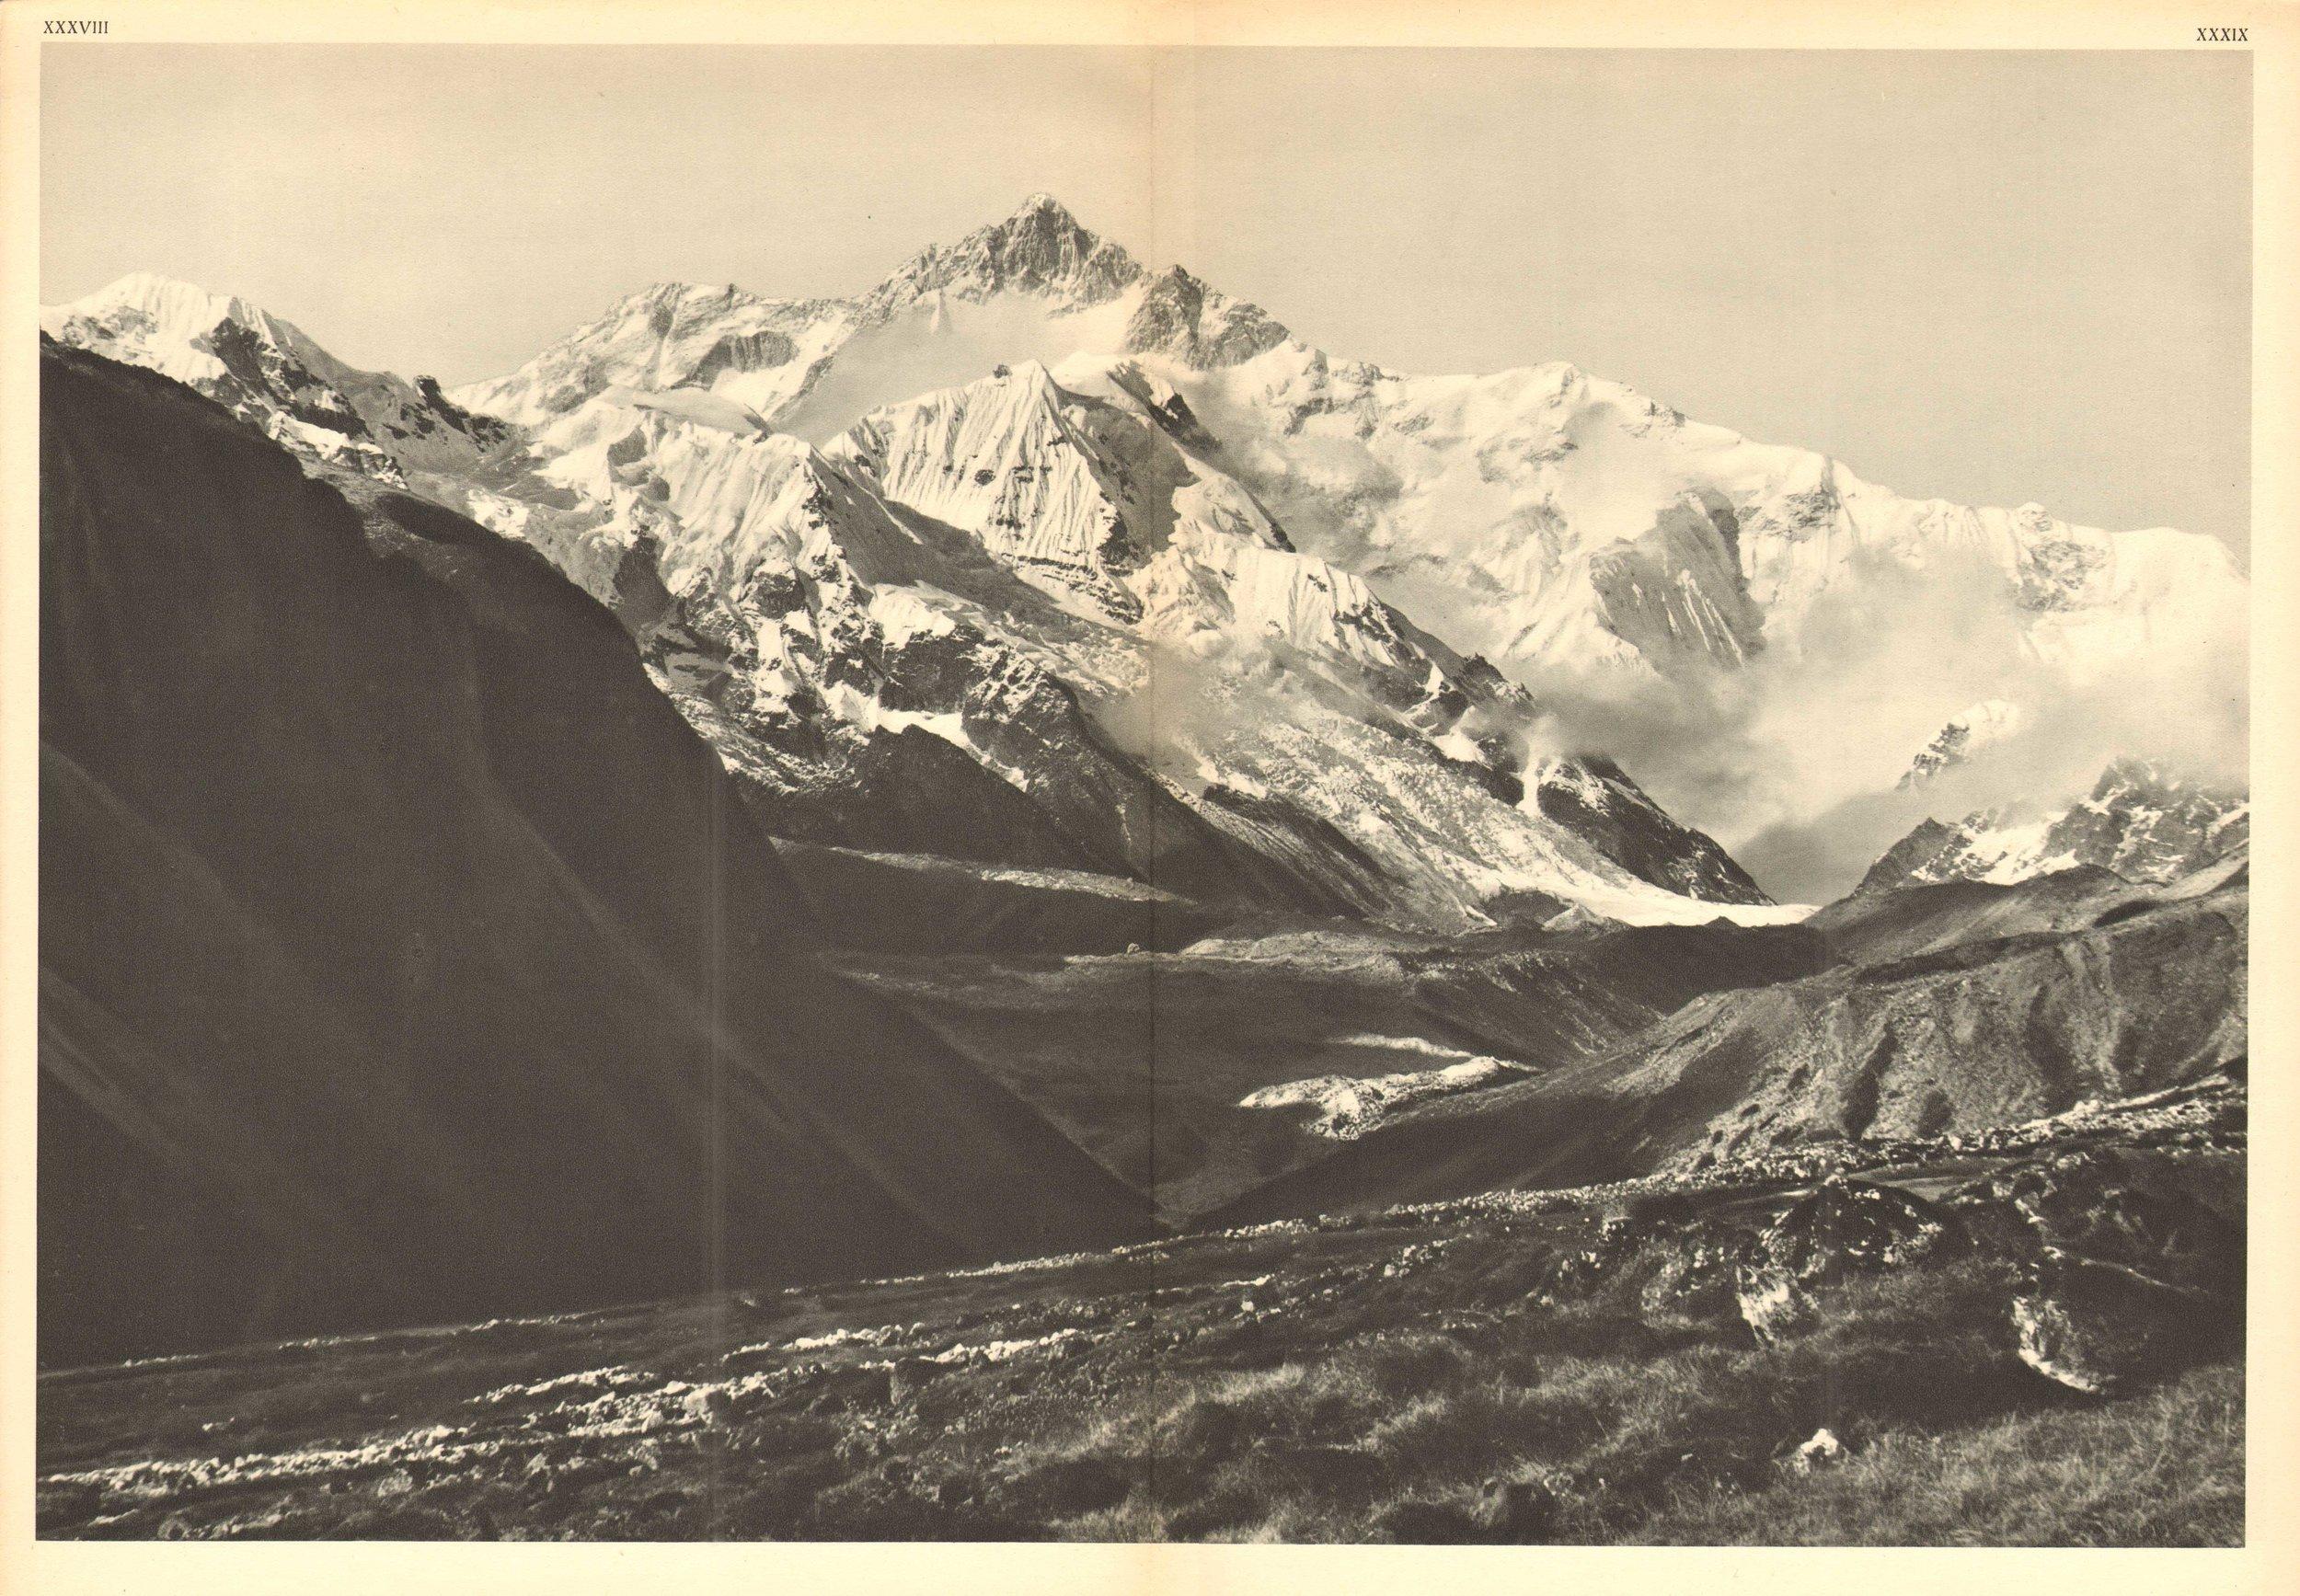 The Kanchenjunga